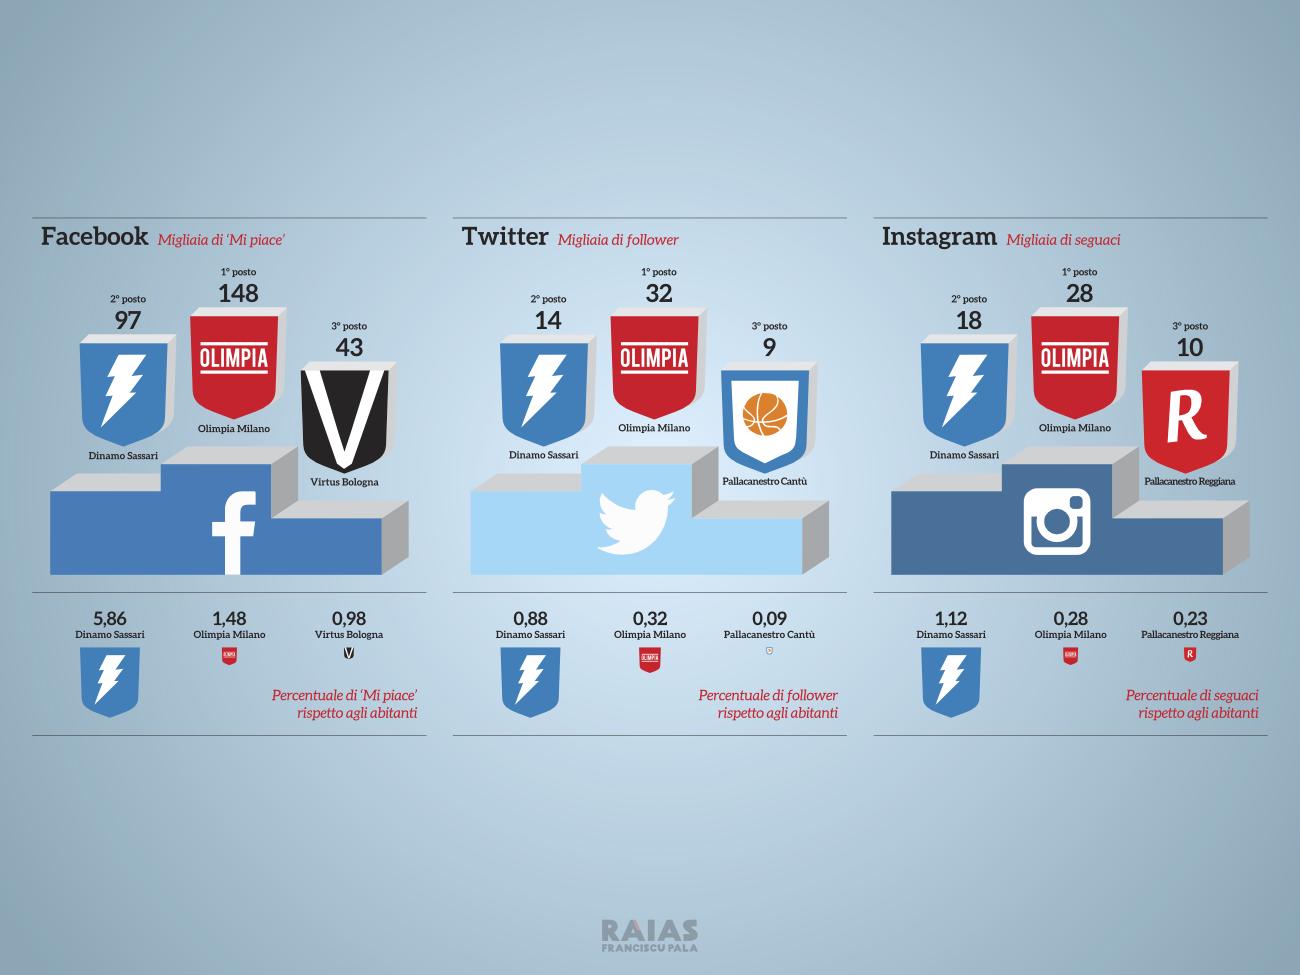 raias-franciscu-pala-dinamo-infografica